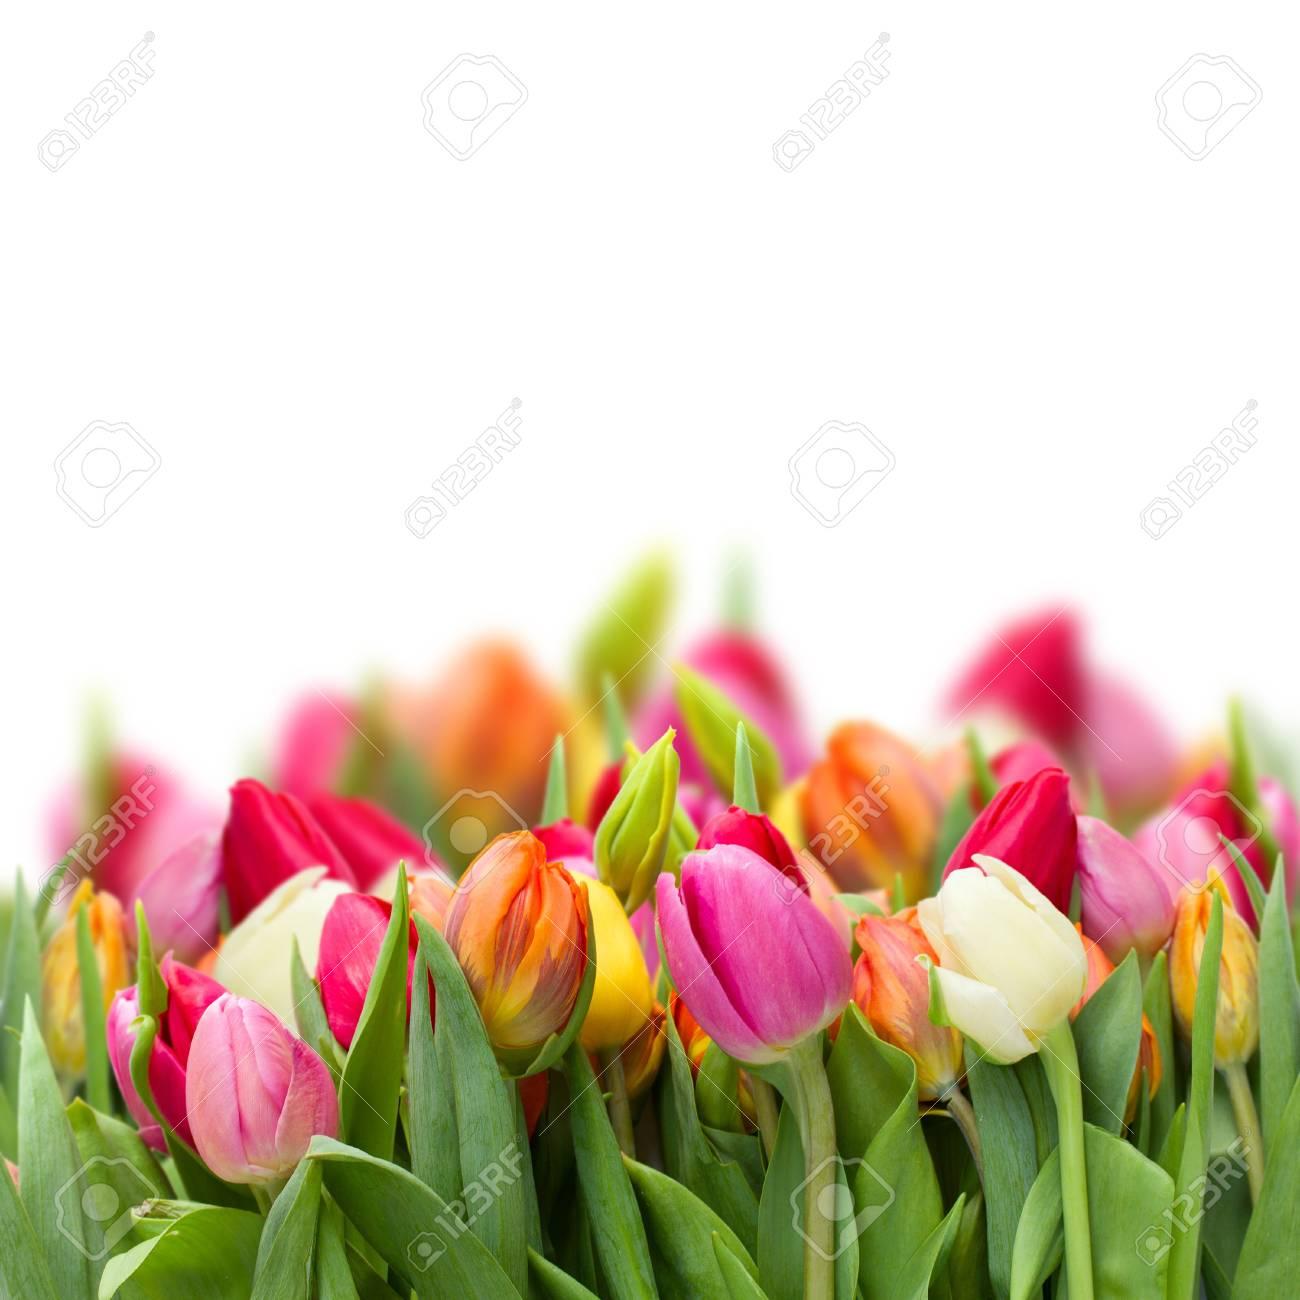 growing fresh spring  tulips isolated on white background Stock Photo - 18275011